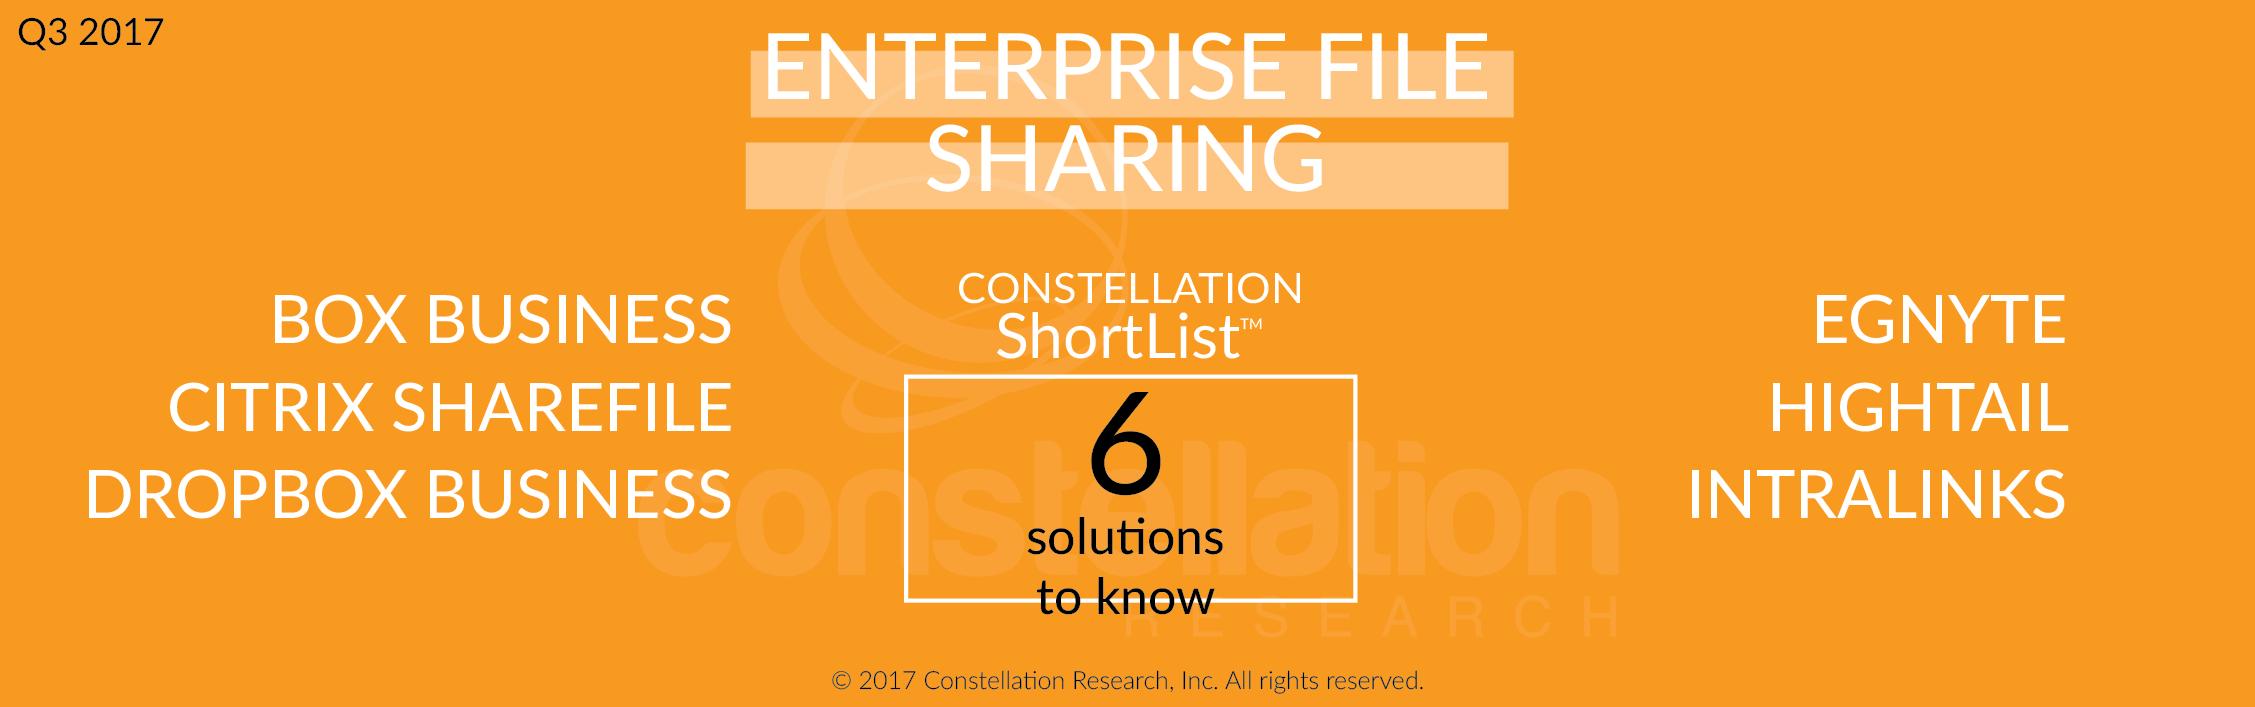 Constellation ShortList Enterprise File Sharing